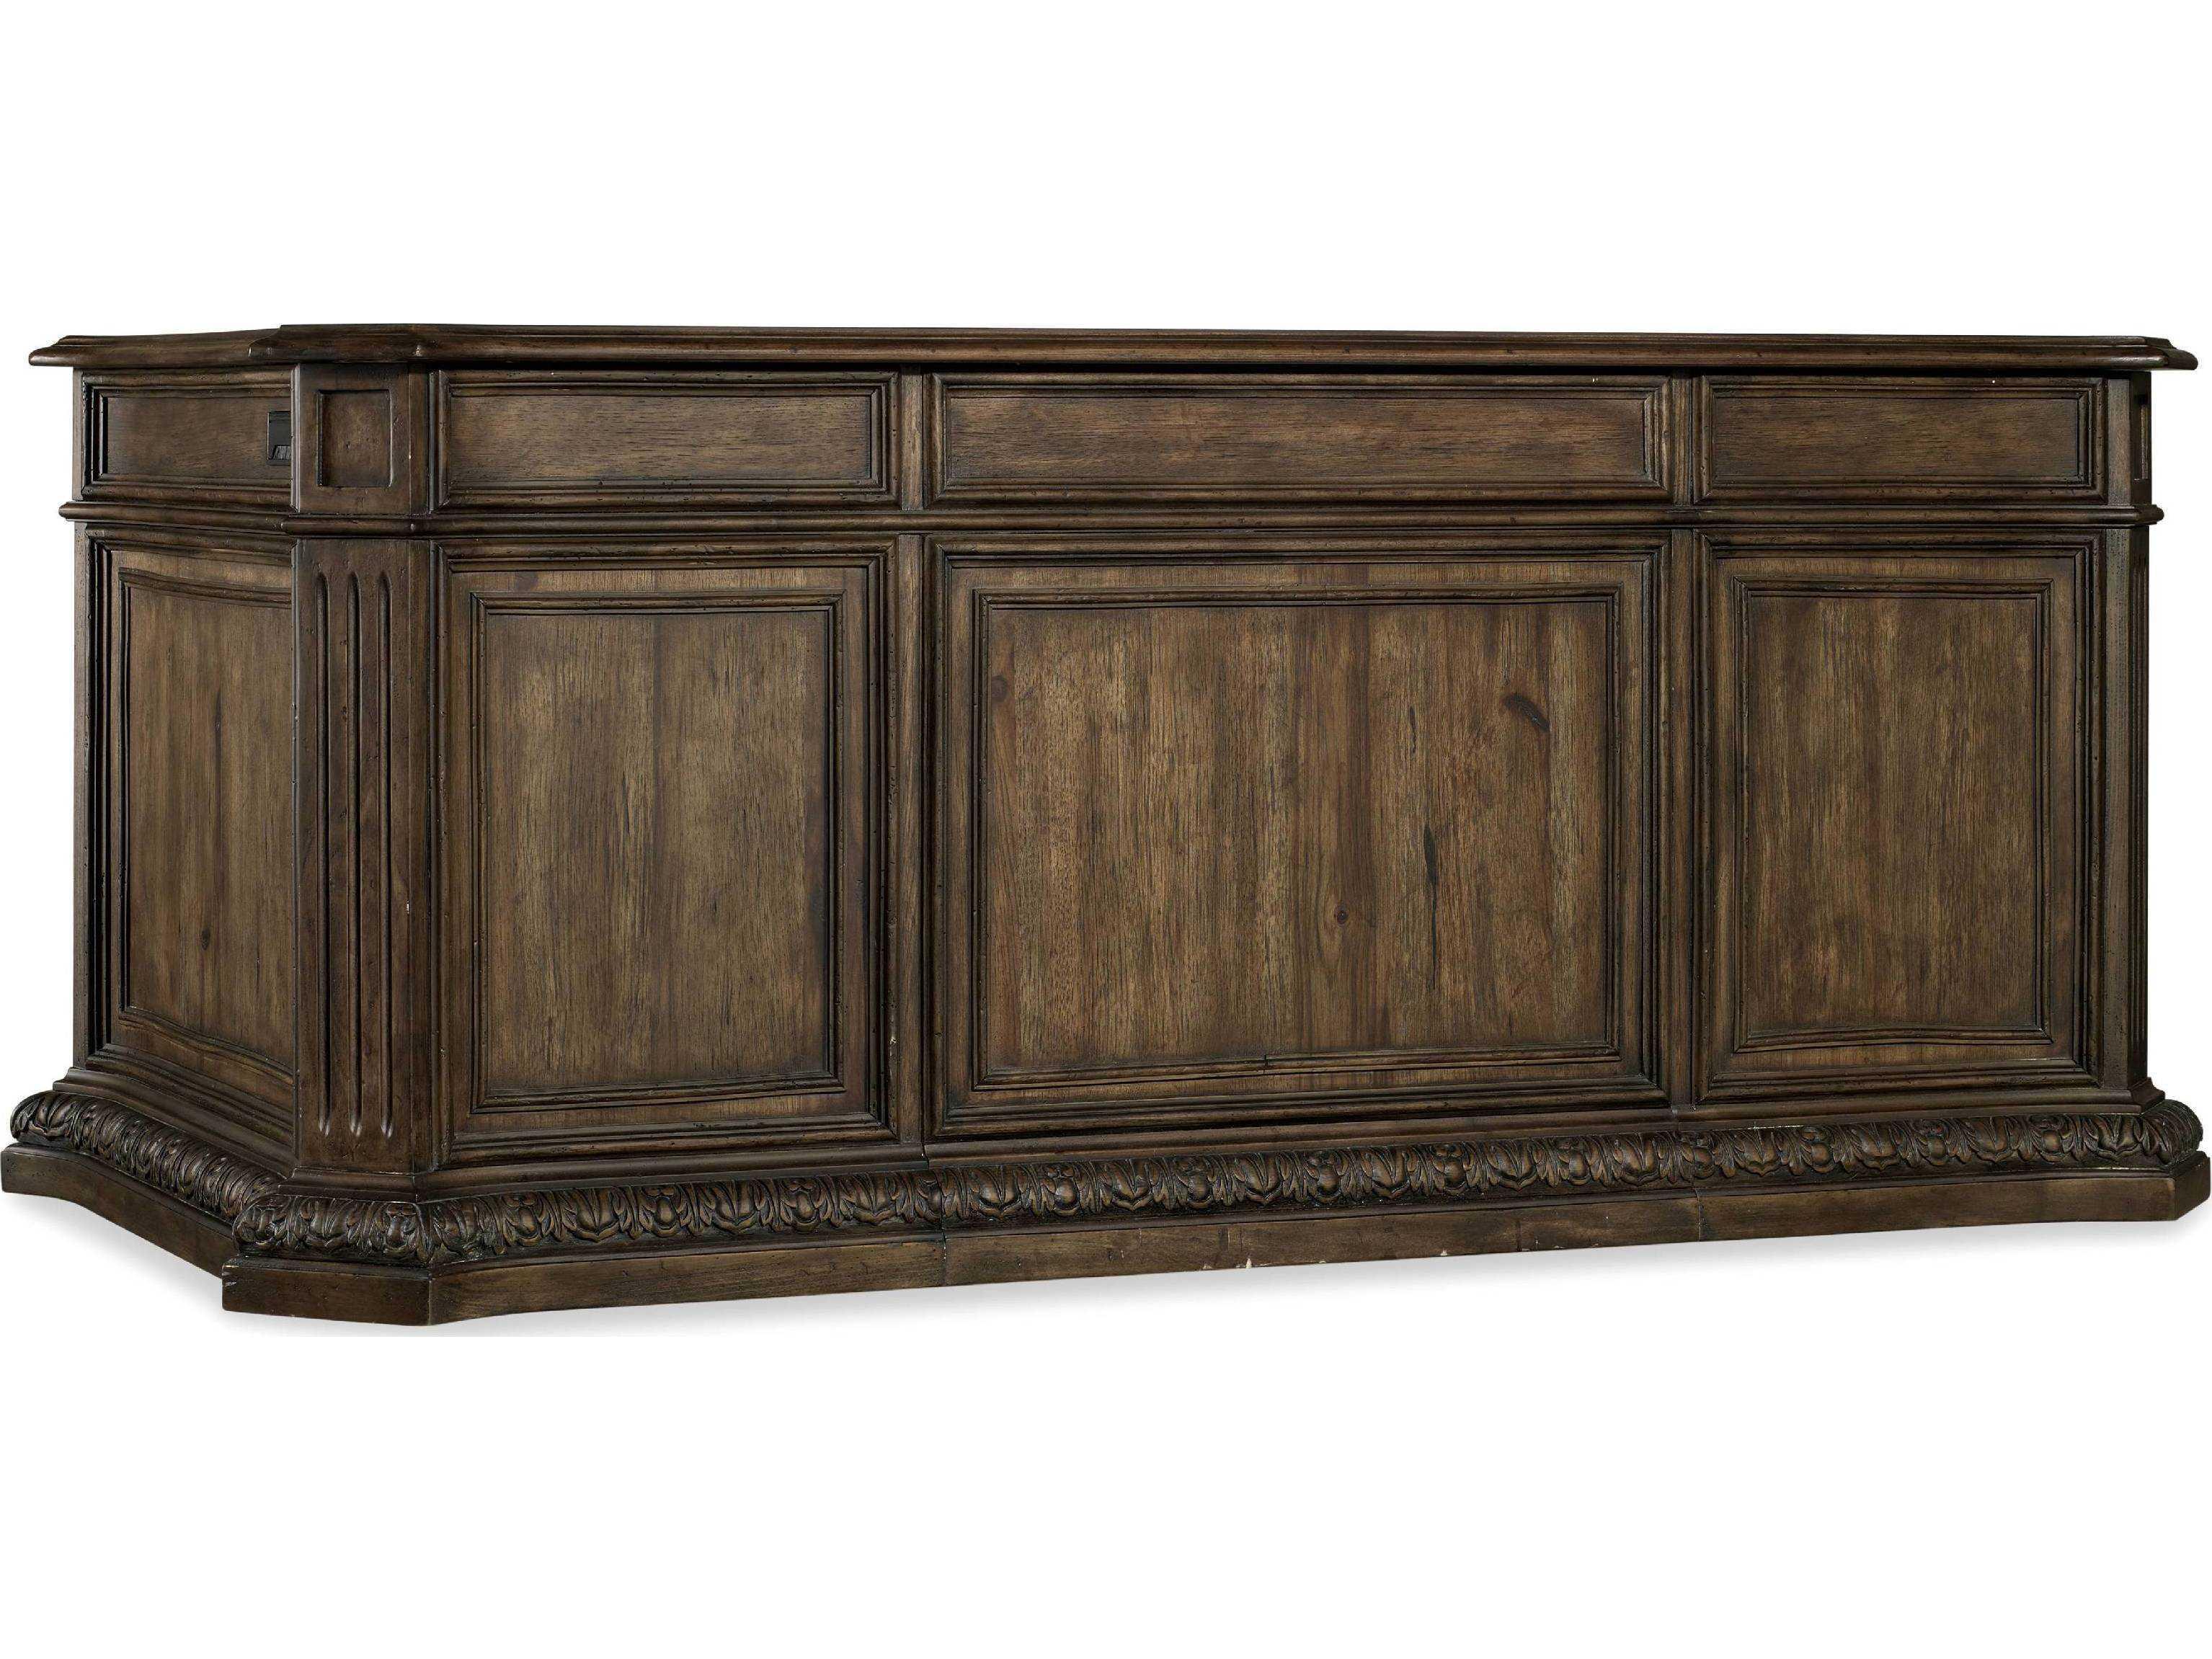 Rustic Americana Hardwood Executive Desk Home Office: Hooker Furniture Rhapsody Rustic Walnut 74''L X 40''W